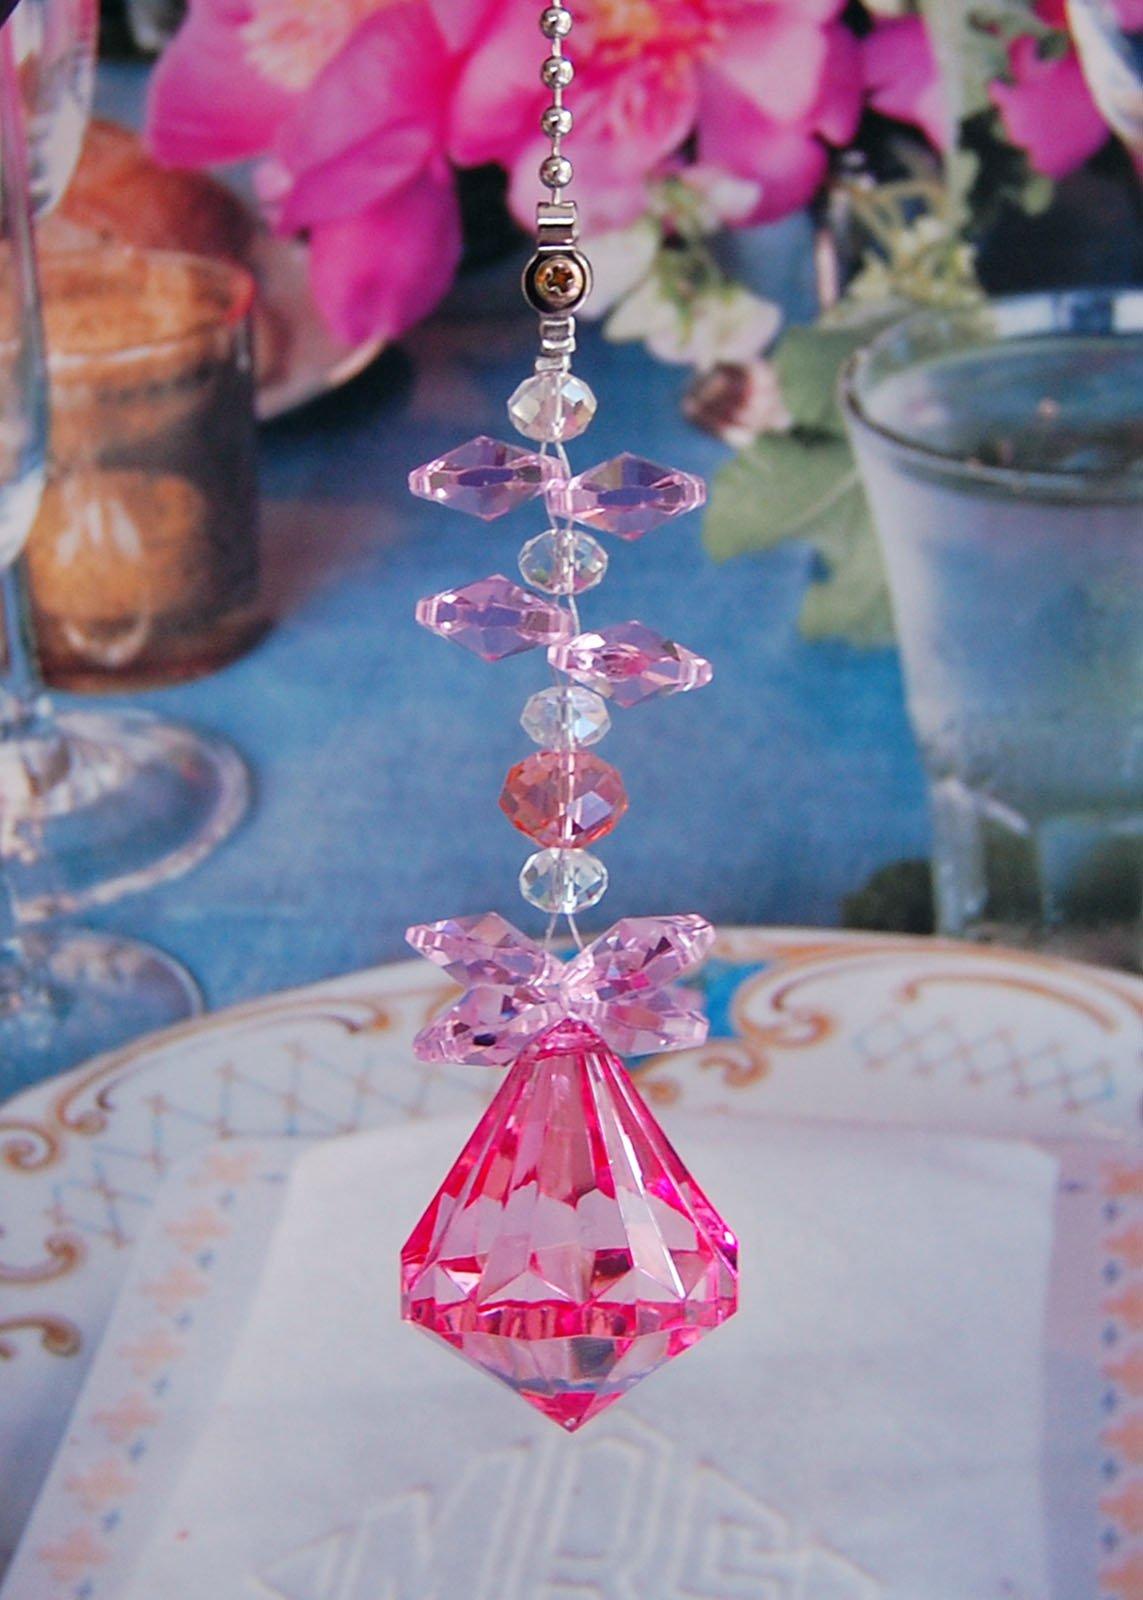 2 of Crystal Diamond Ceiling Lighting Fan Pulls Chain - Pink